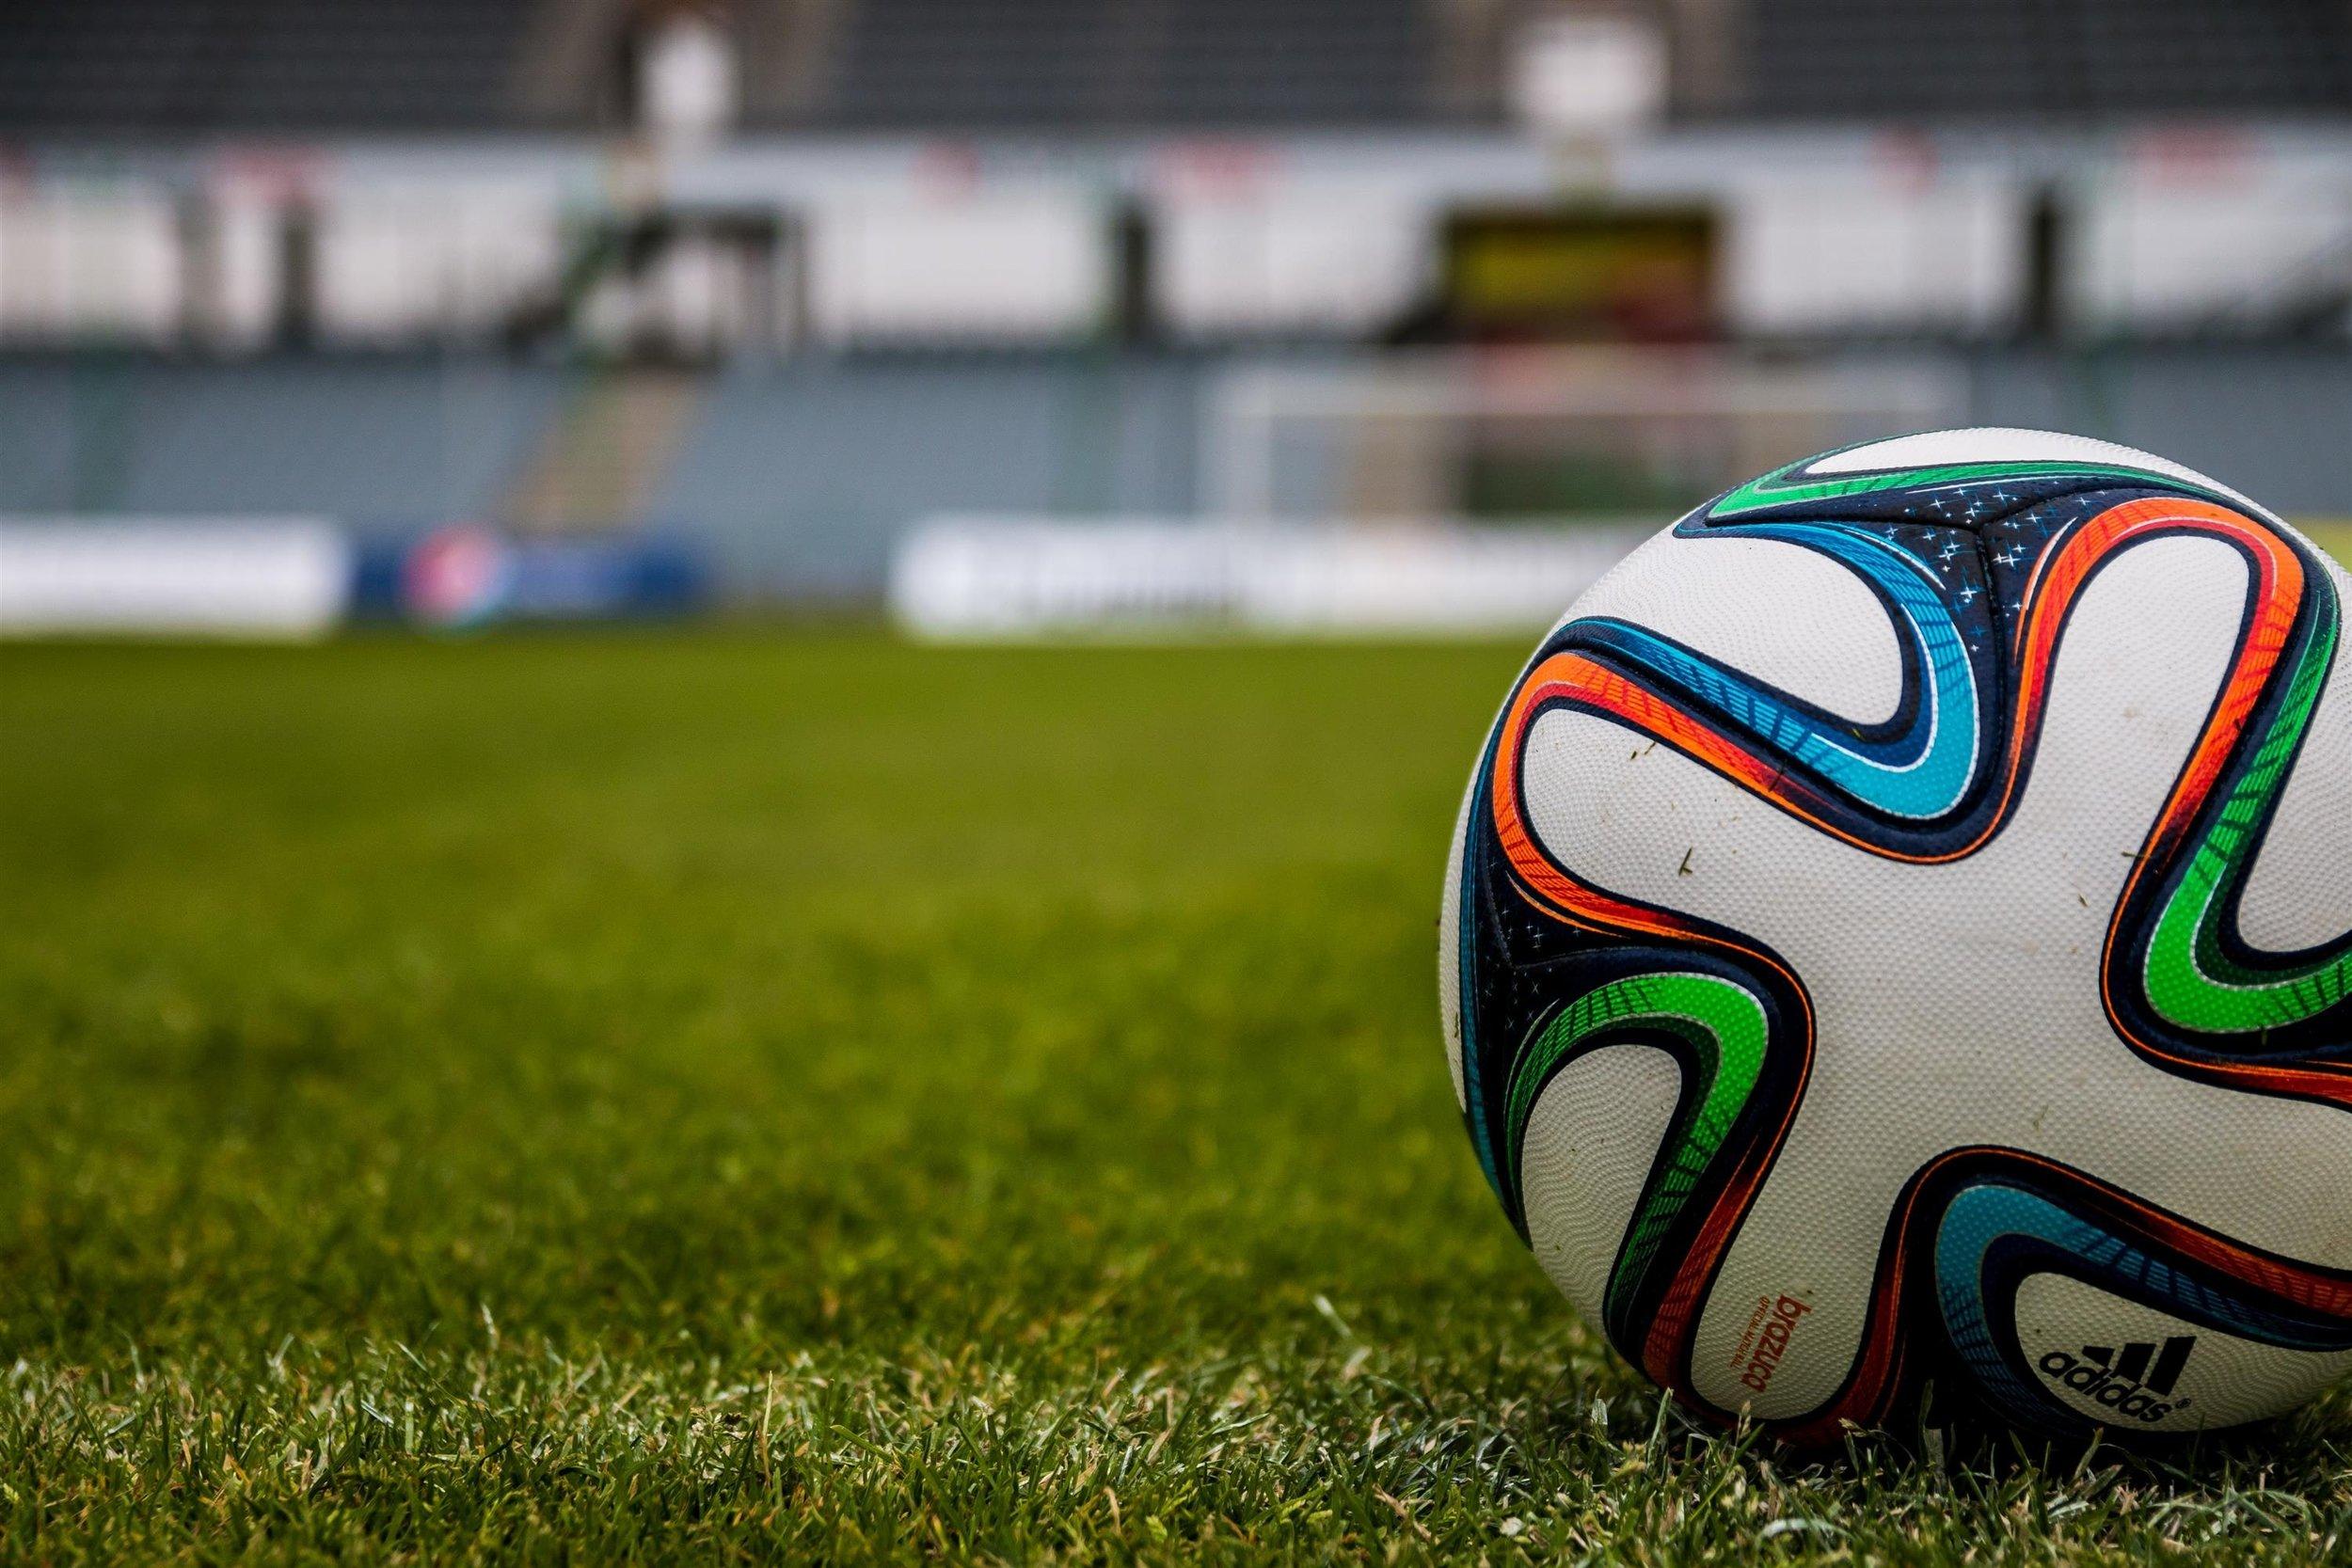 ball-football-game-39562.jpg